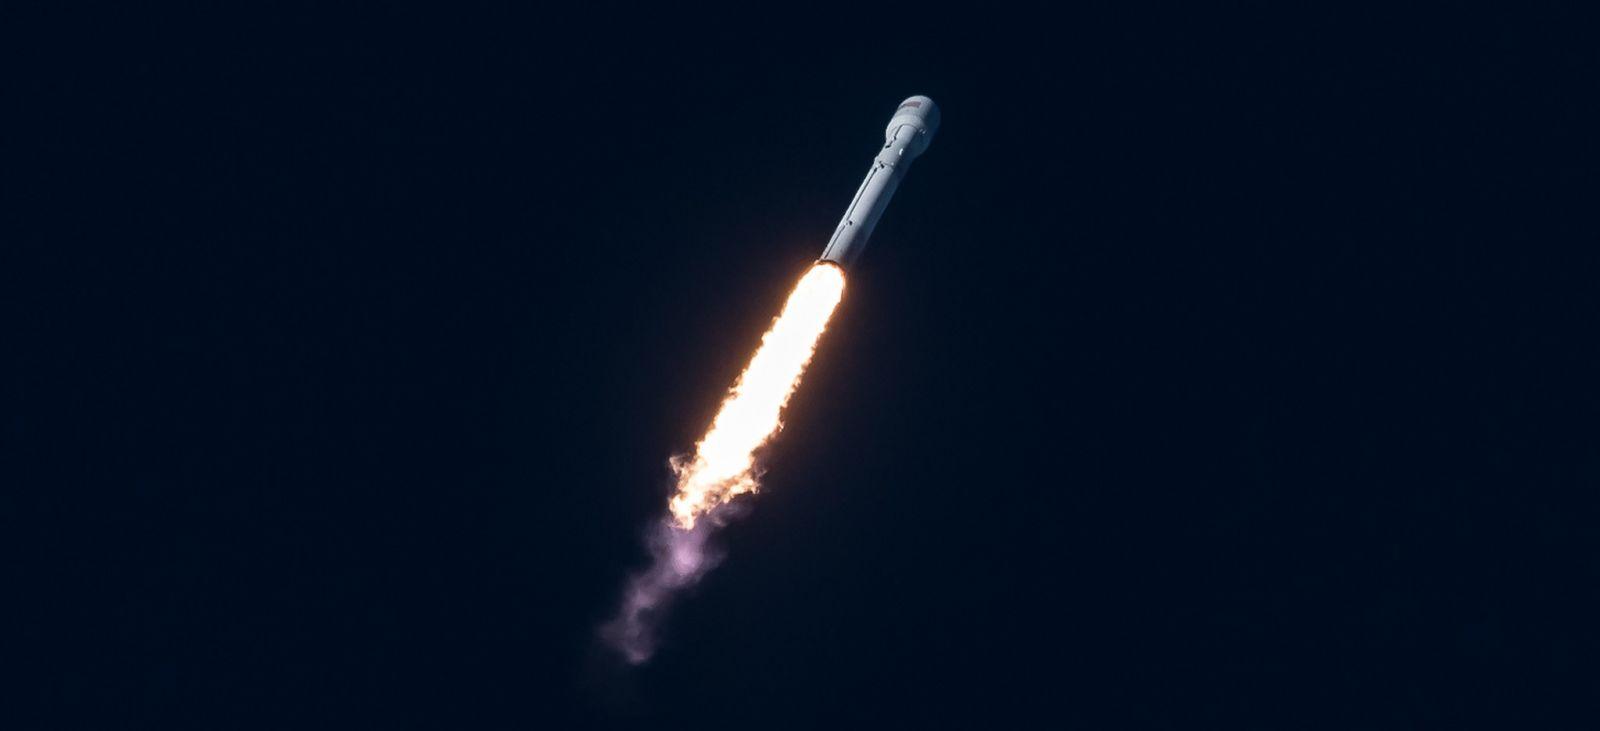 Intelsat-35e launch